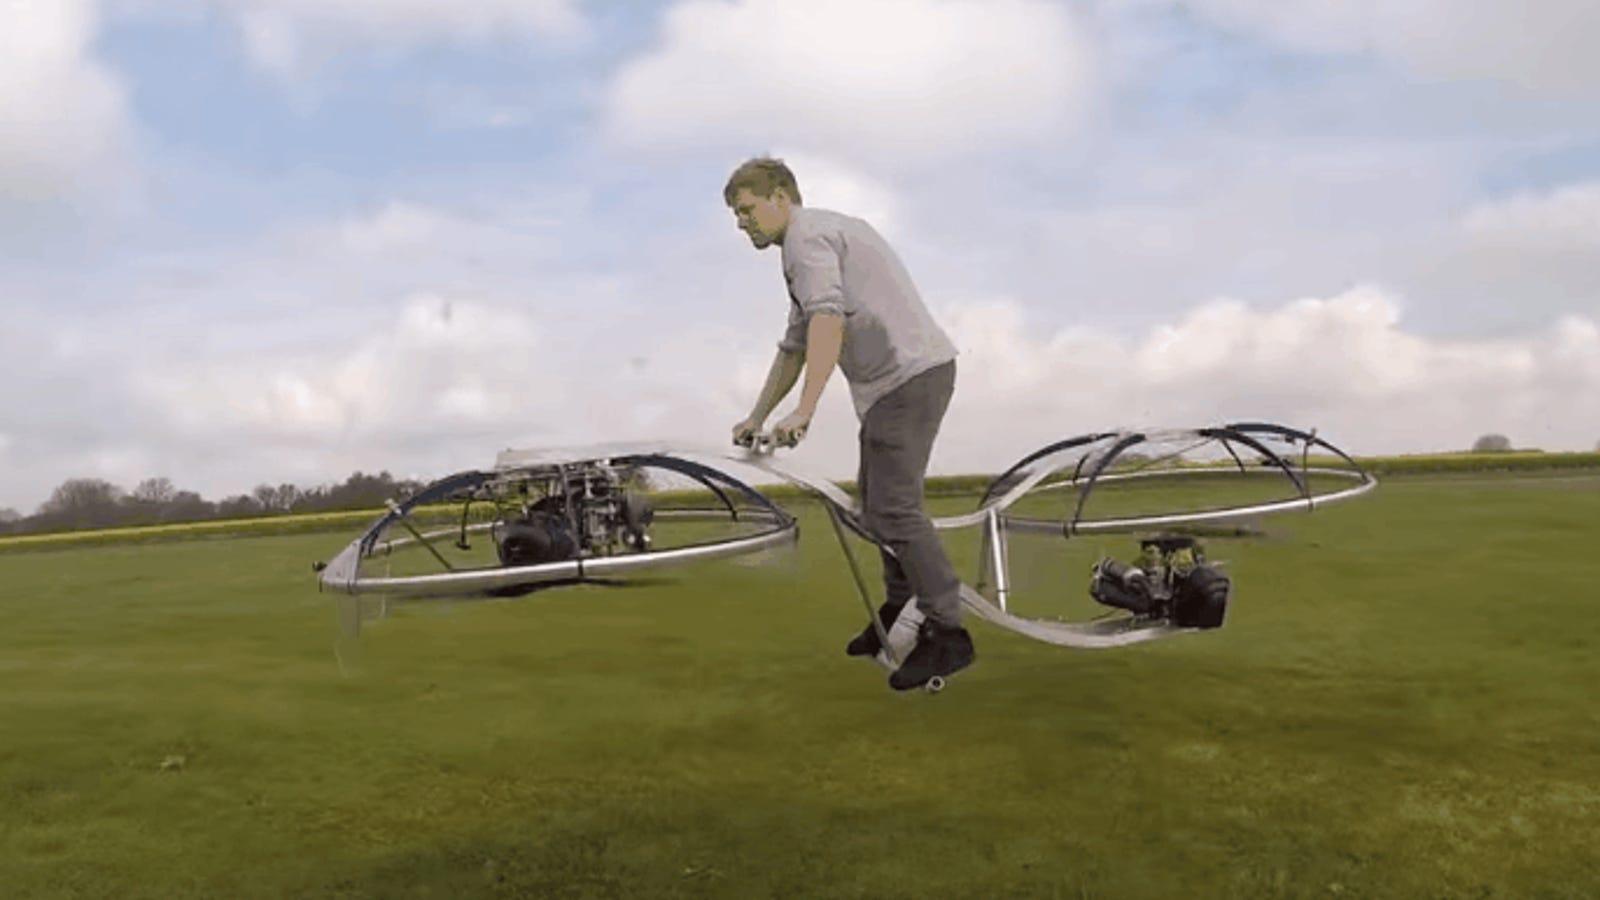 Fabrica una moto voladora casera completamente funcional usando dos ventiladores gigantes